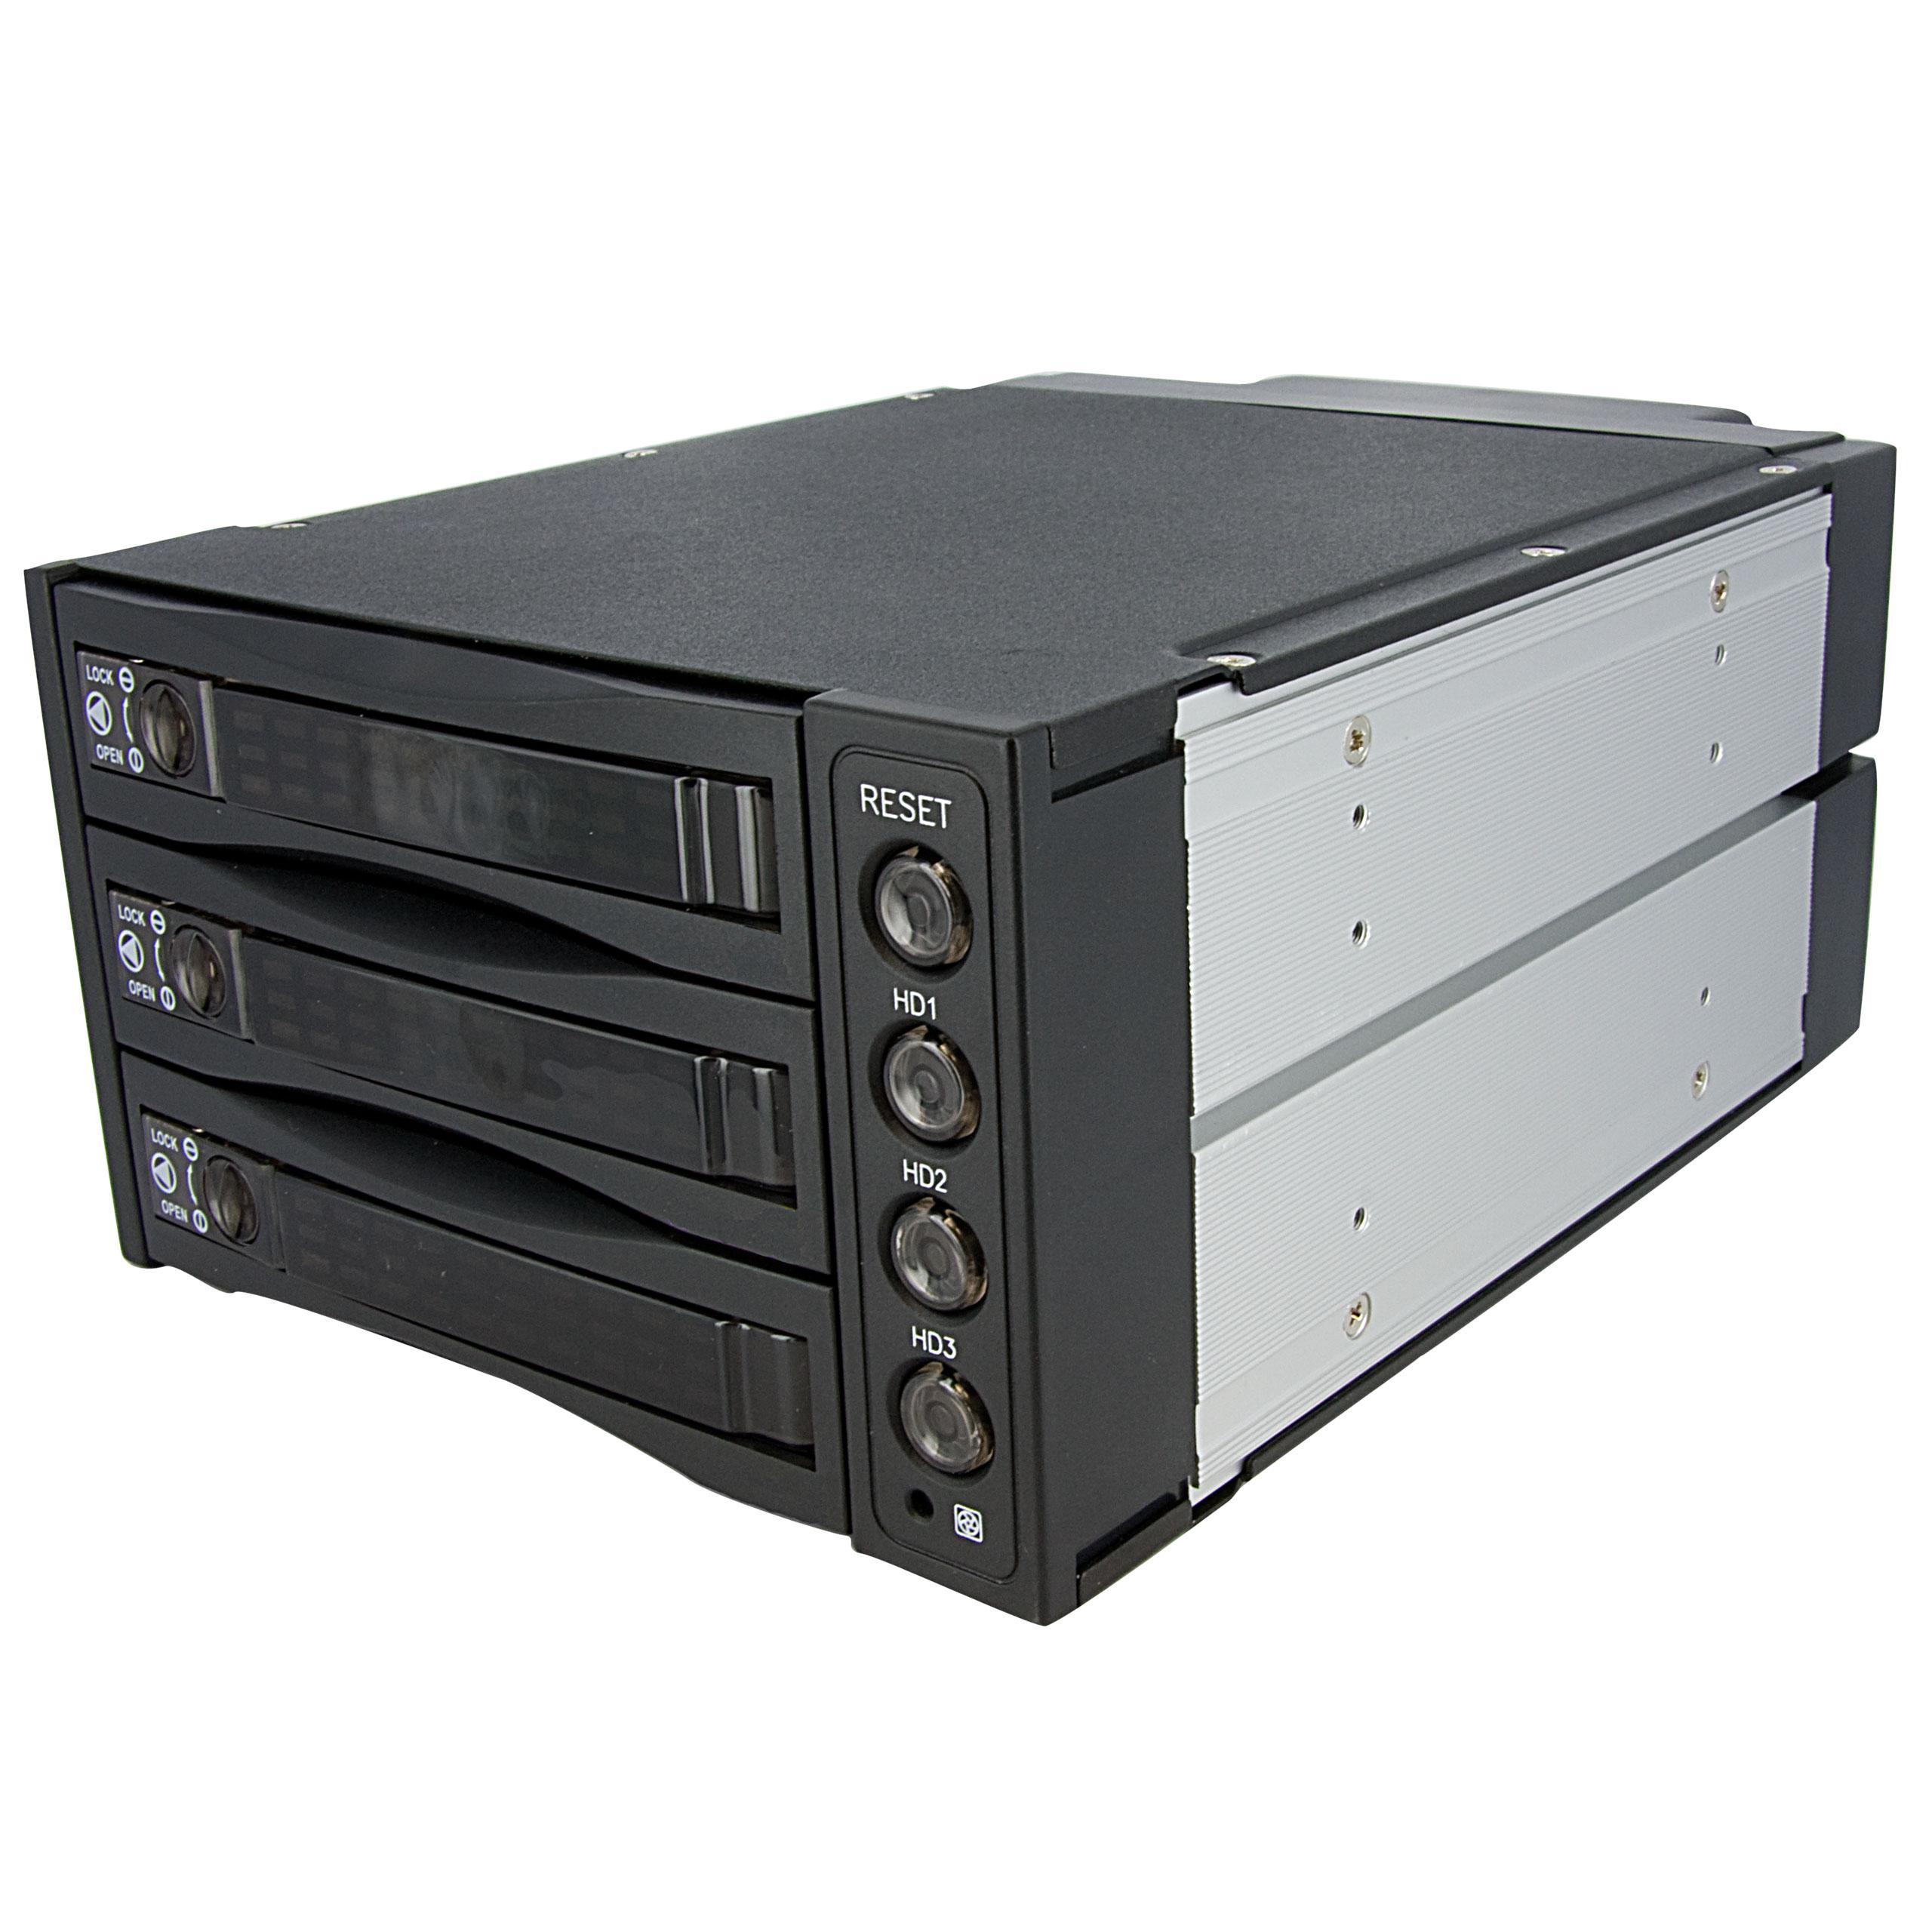 fractal fd with array nas psu black hard mini toaster itx drive sfx case design large